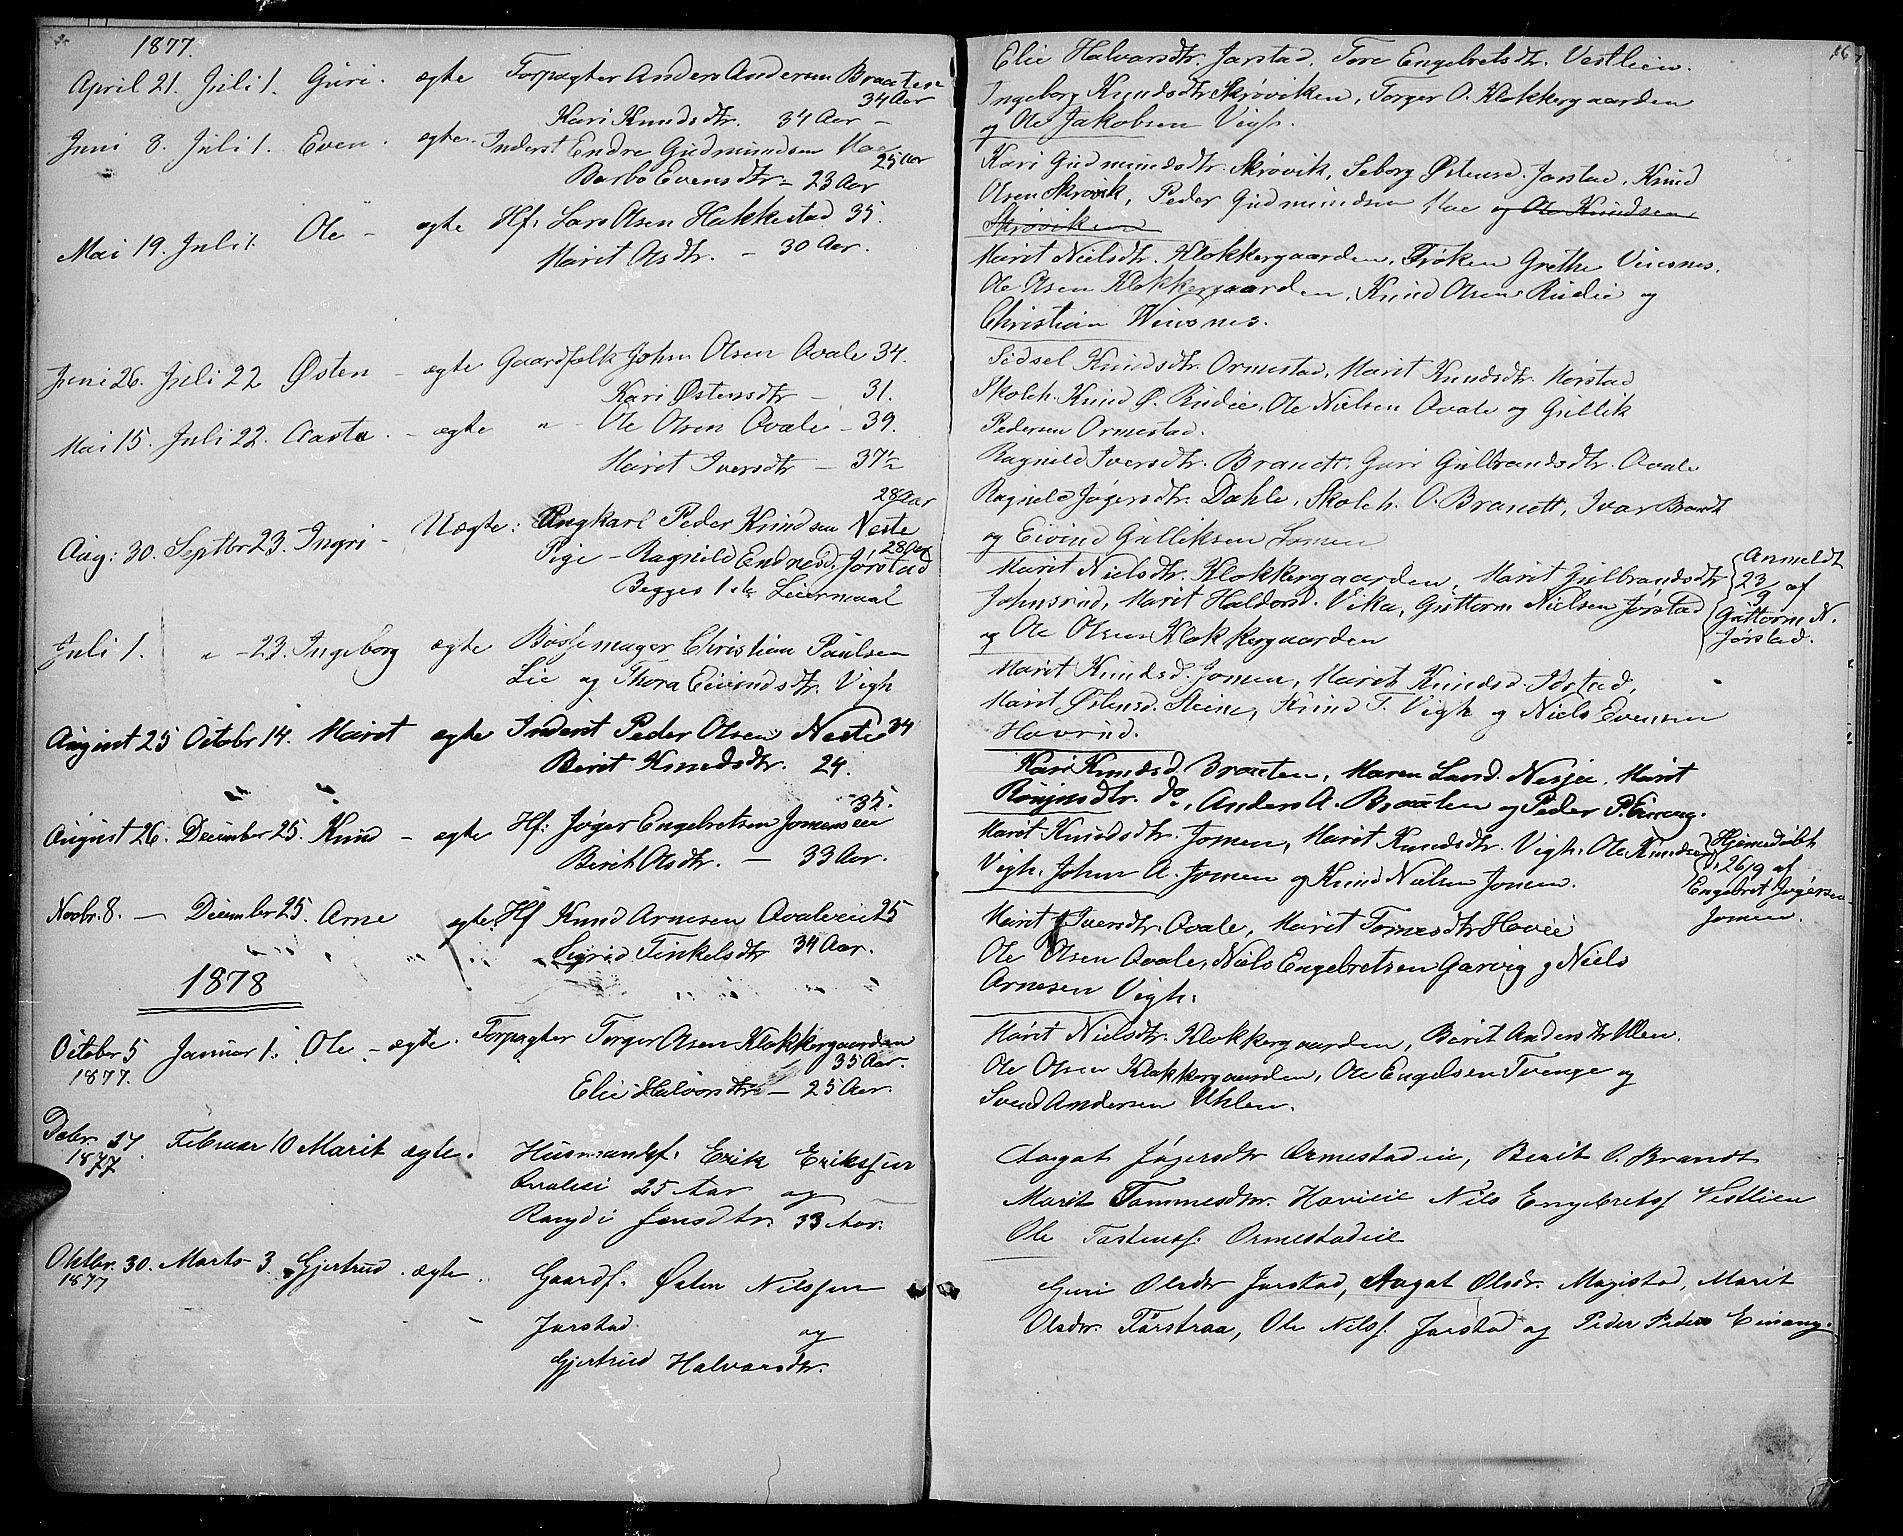 SAH, Vestre Slidre prestekontor, Klokkerbok nr. 1, 1869-1882, s. 16